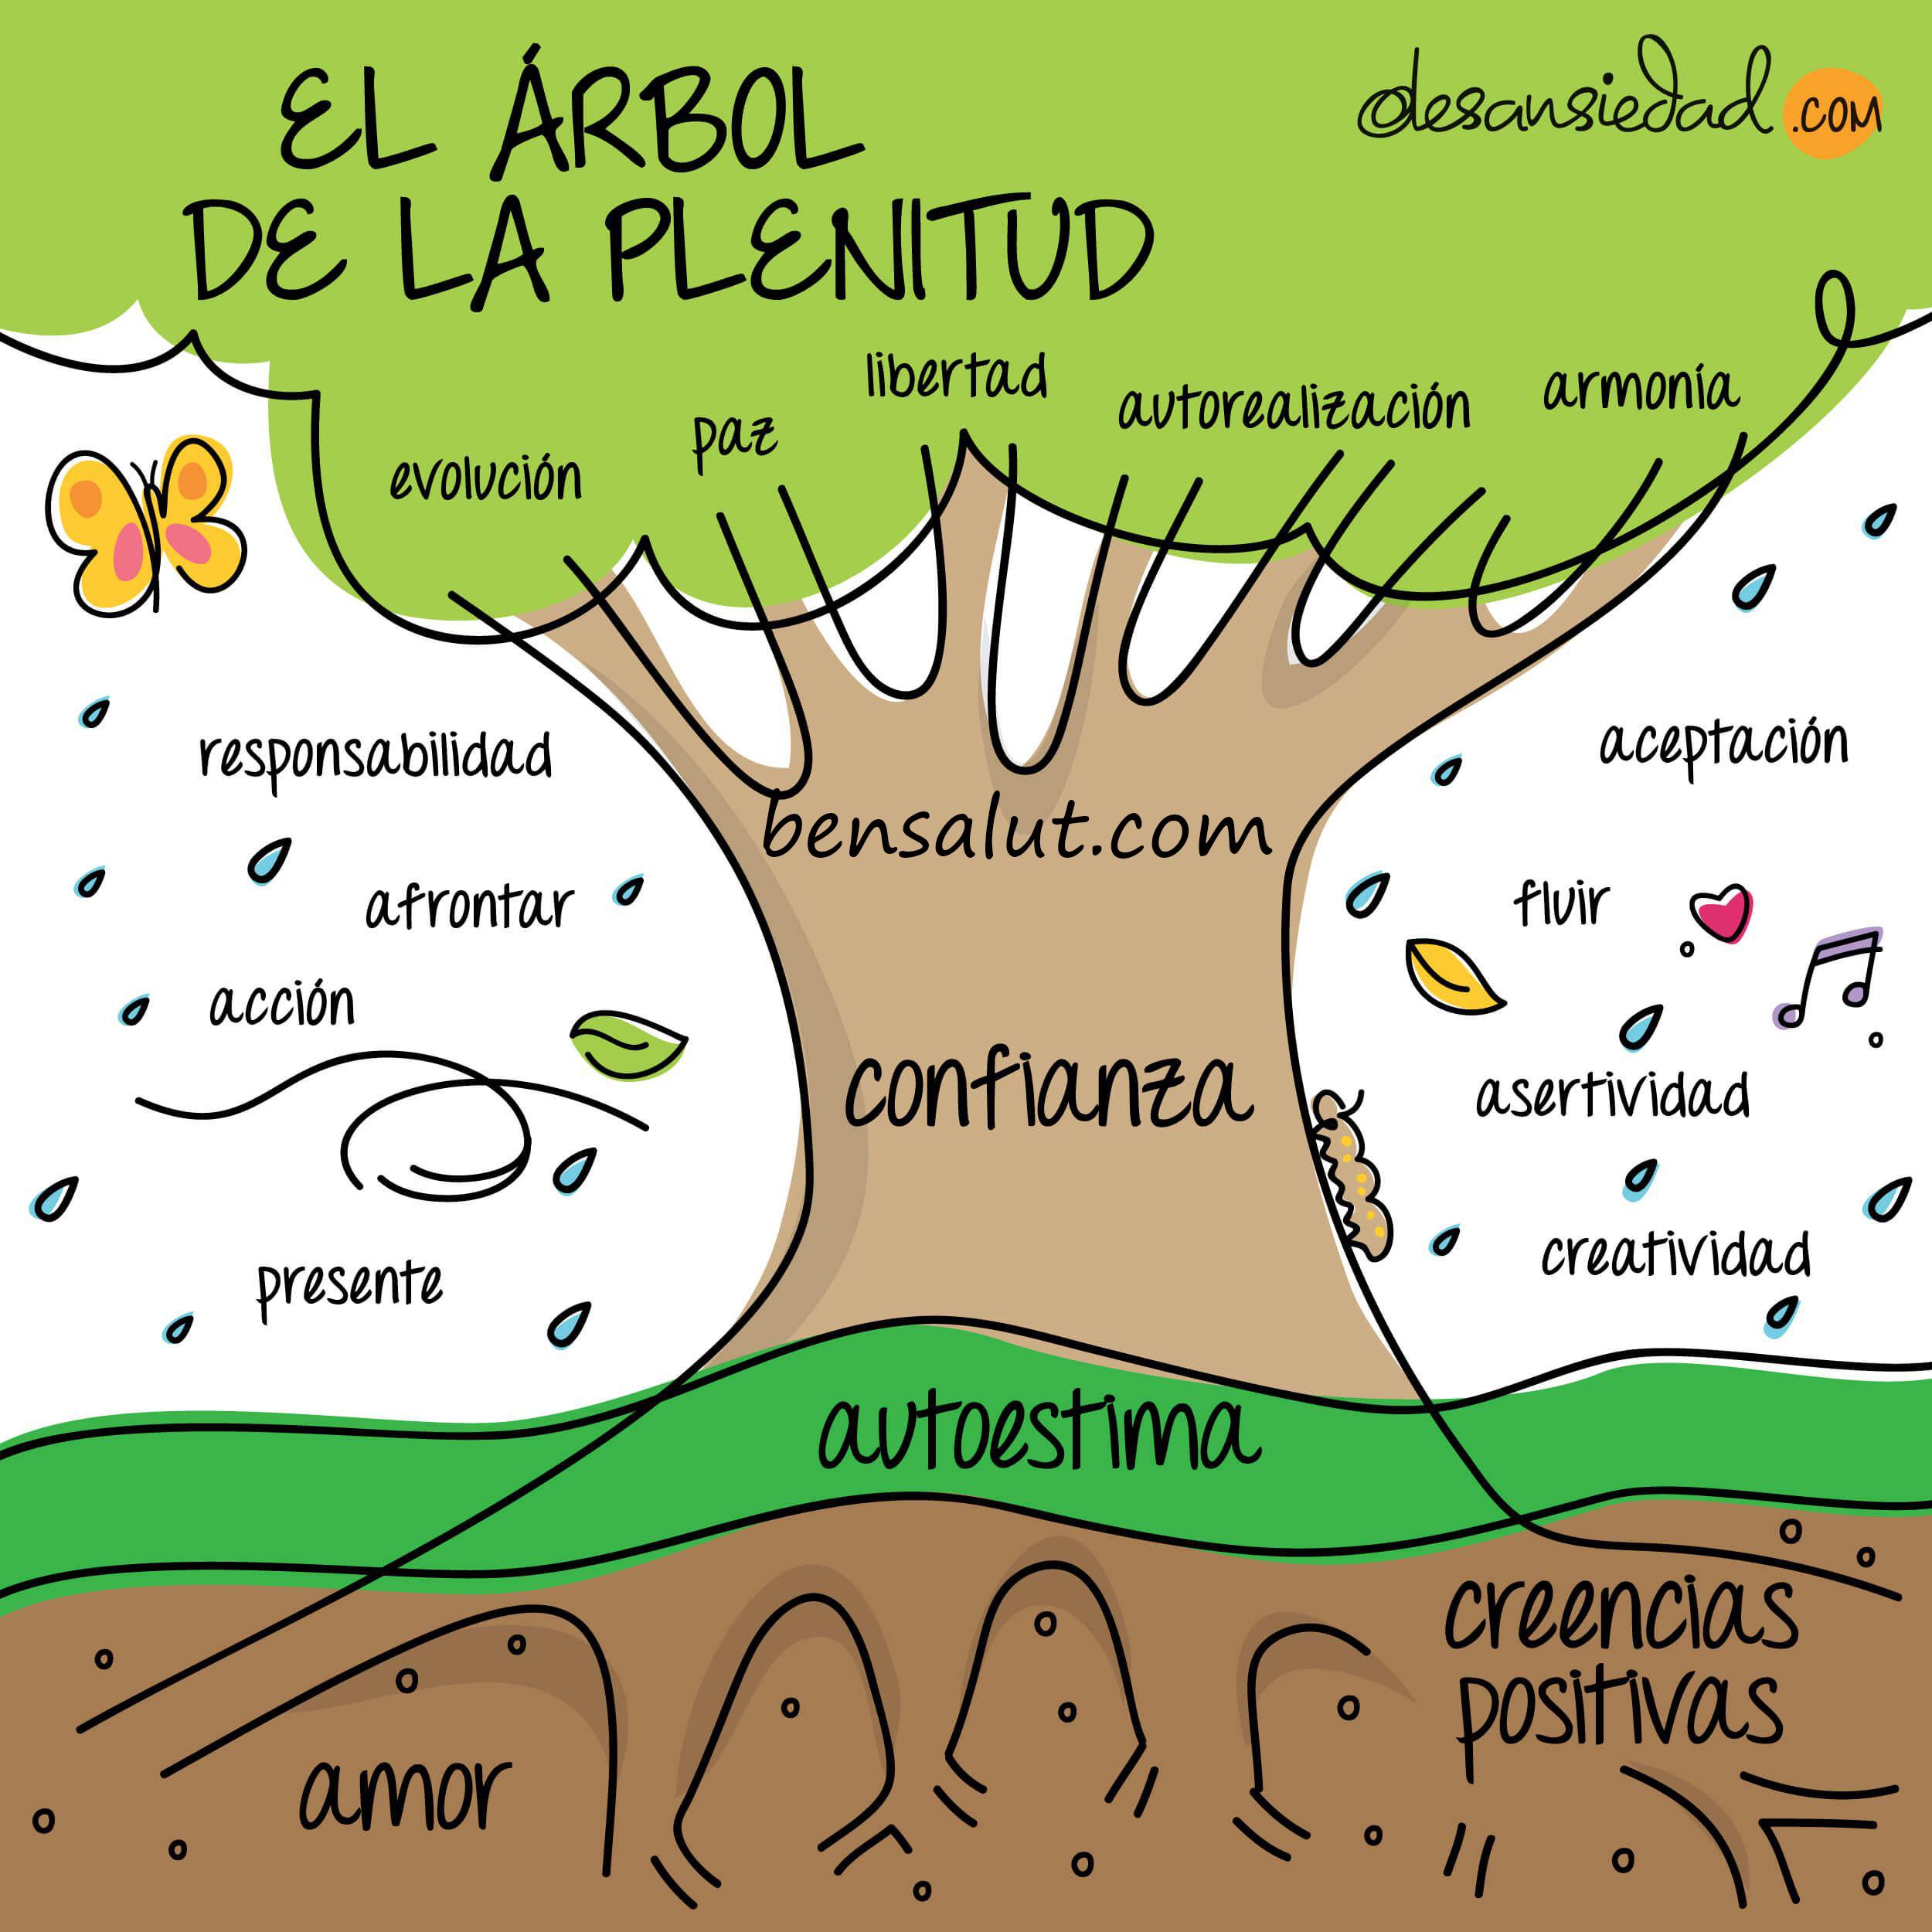 el_arbol_de_la_plenitud.jpg